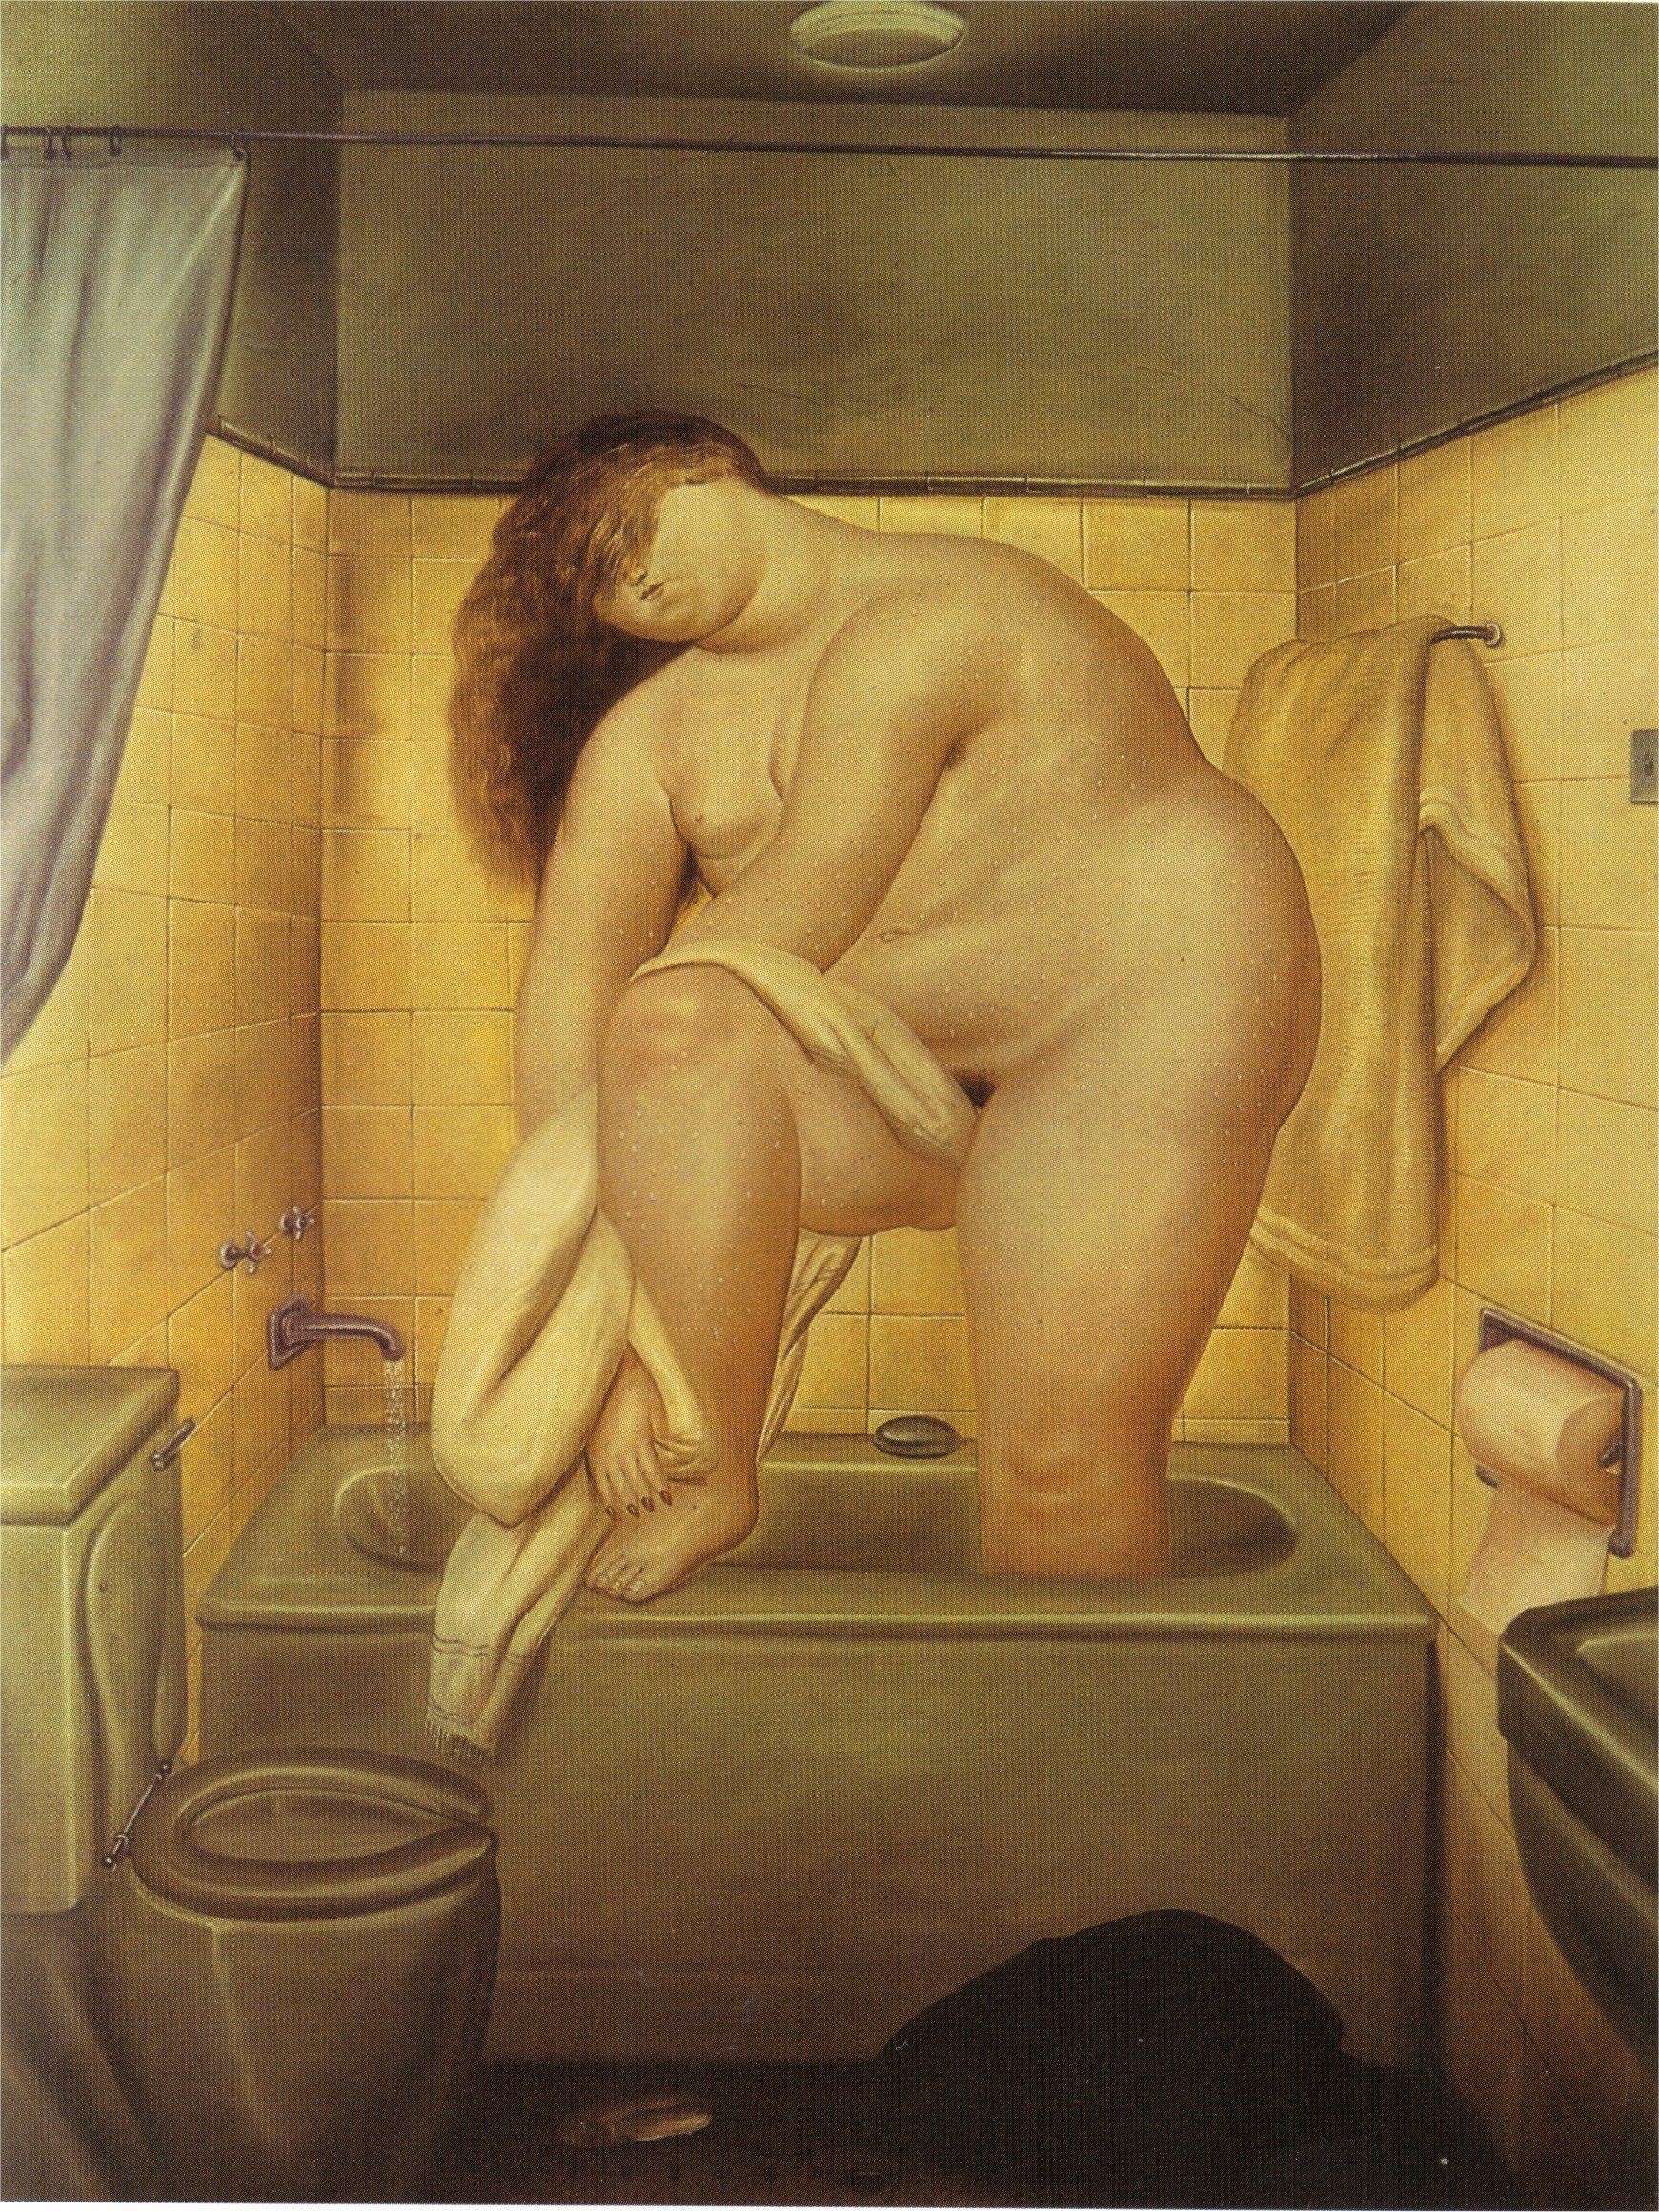 Tribute to Bonnard - Fernando Botero | artearte | Pinterest ...